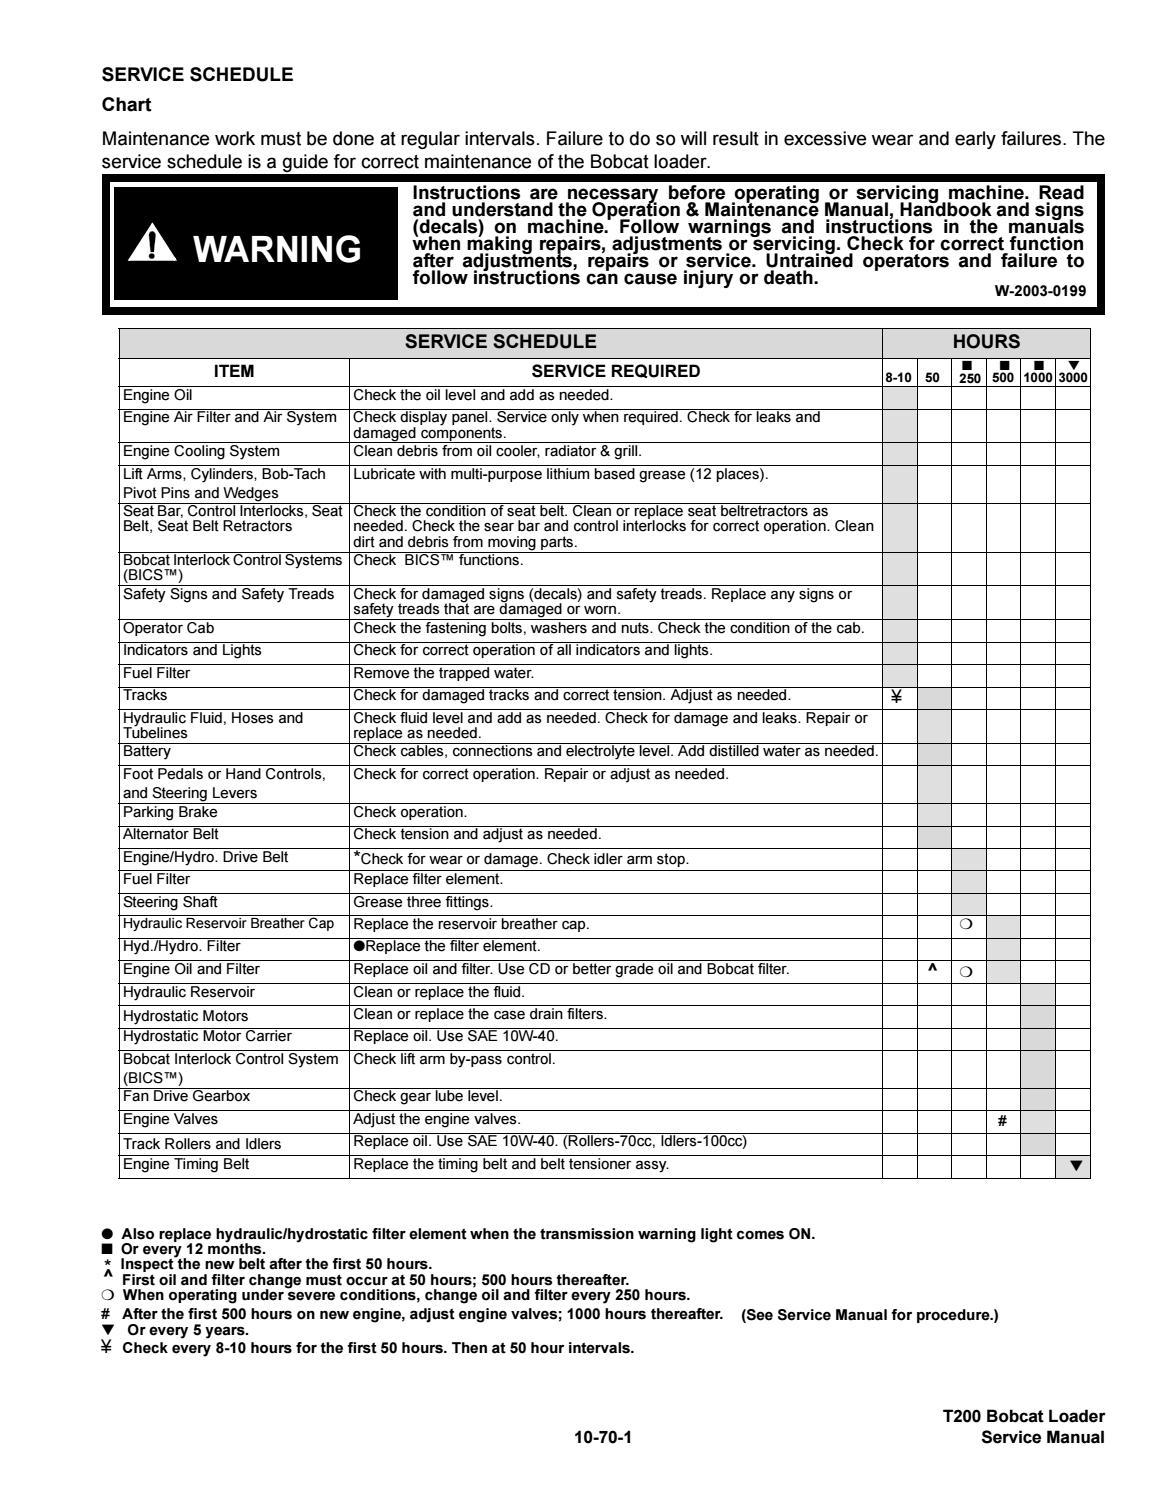 BOBCAT T200 COMPACT TRACK LOADER Service Repair Manual SN